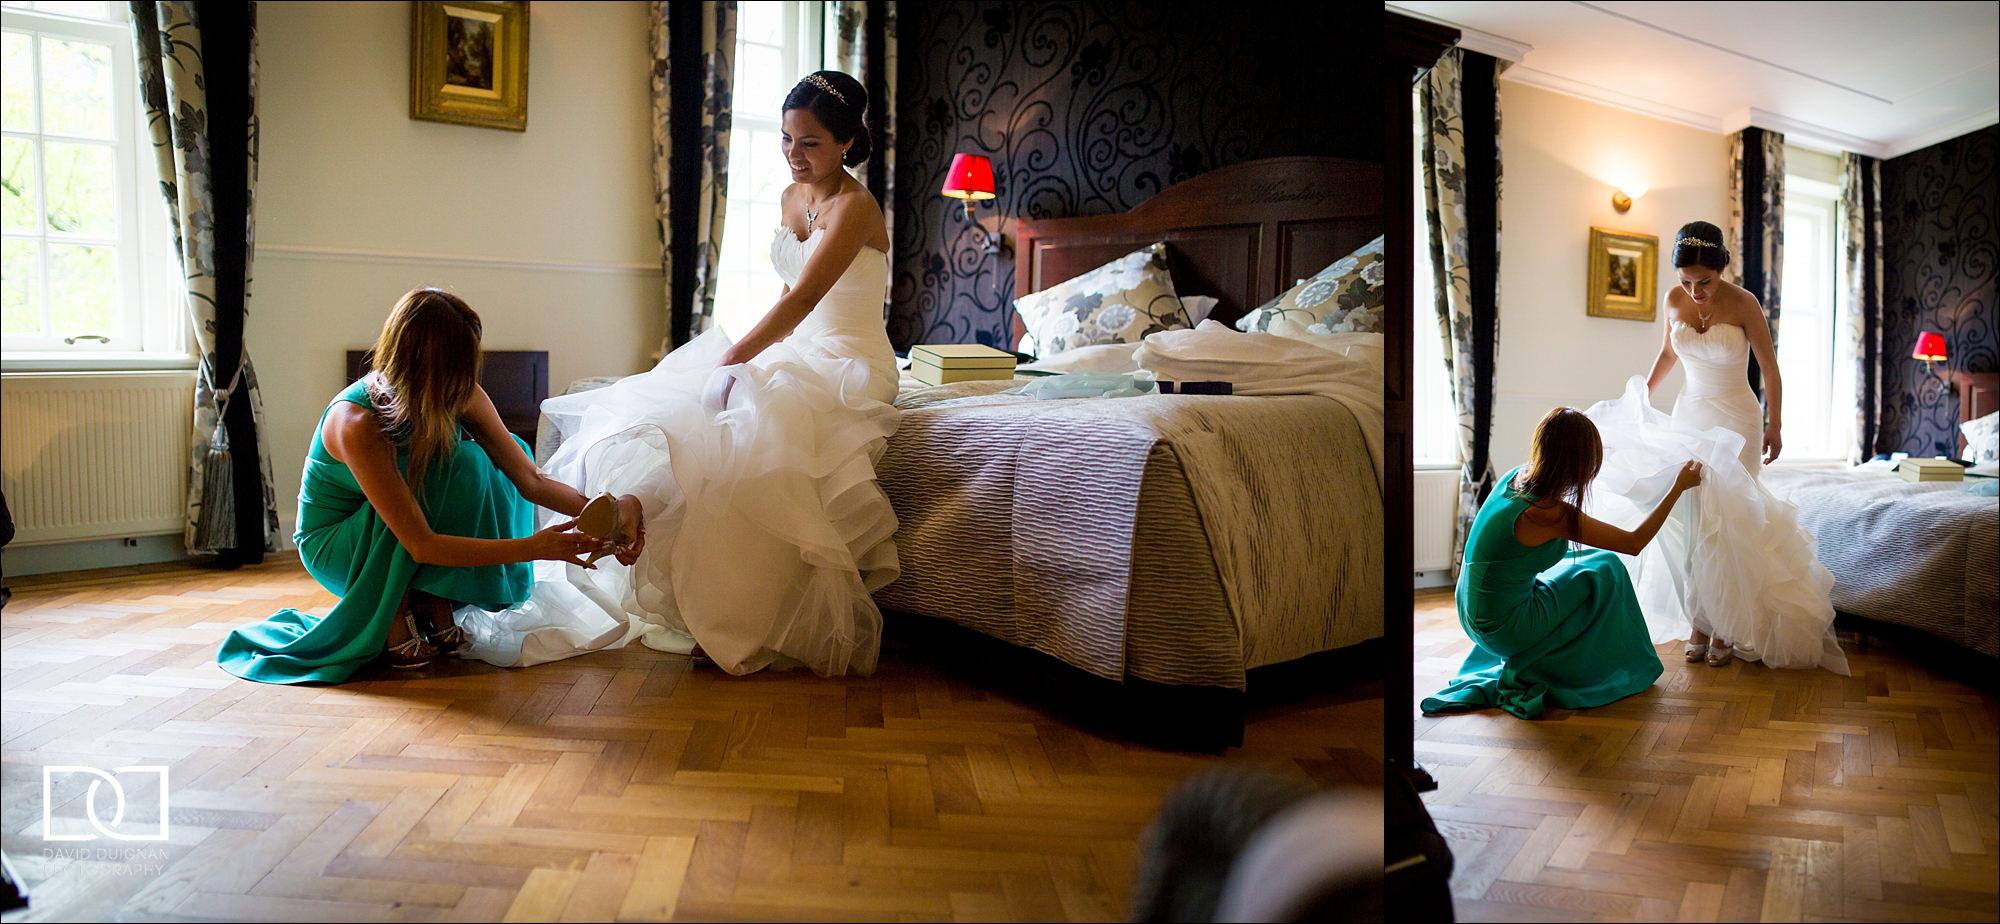 dublin wedding photographer david duignan photography wedding photos 0007